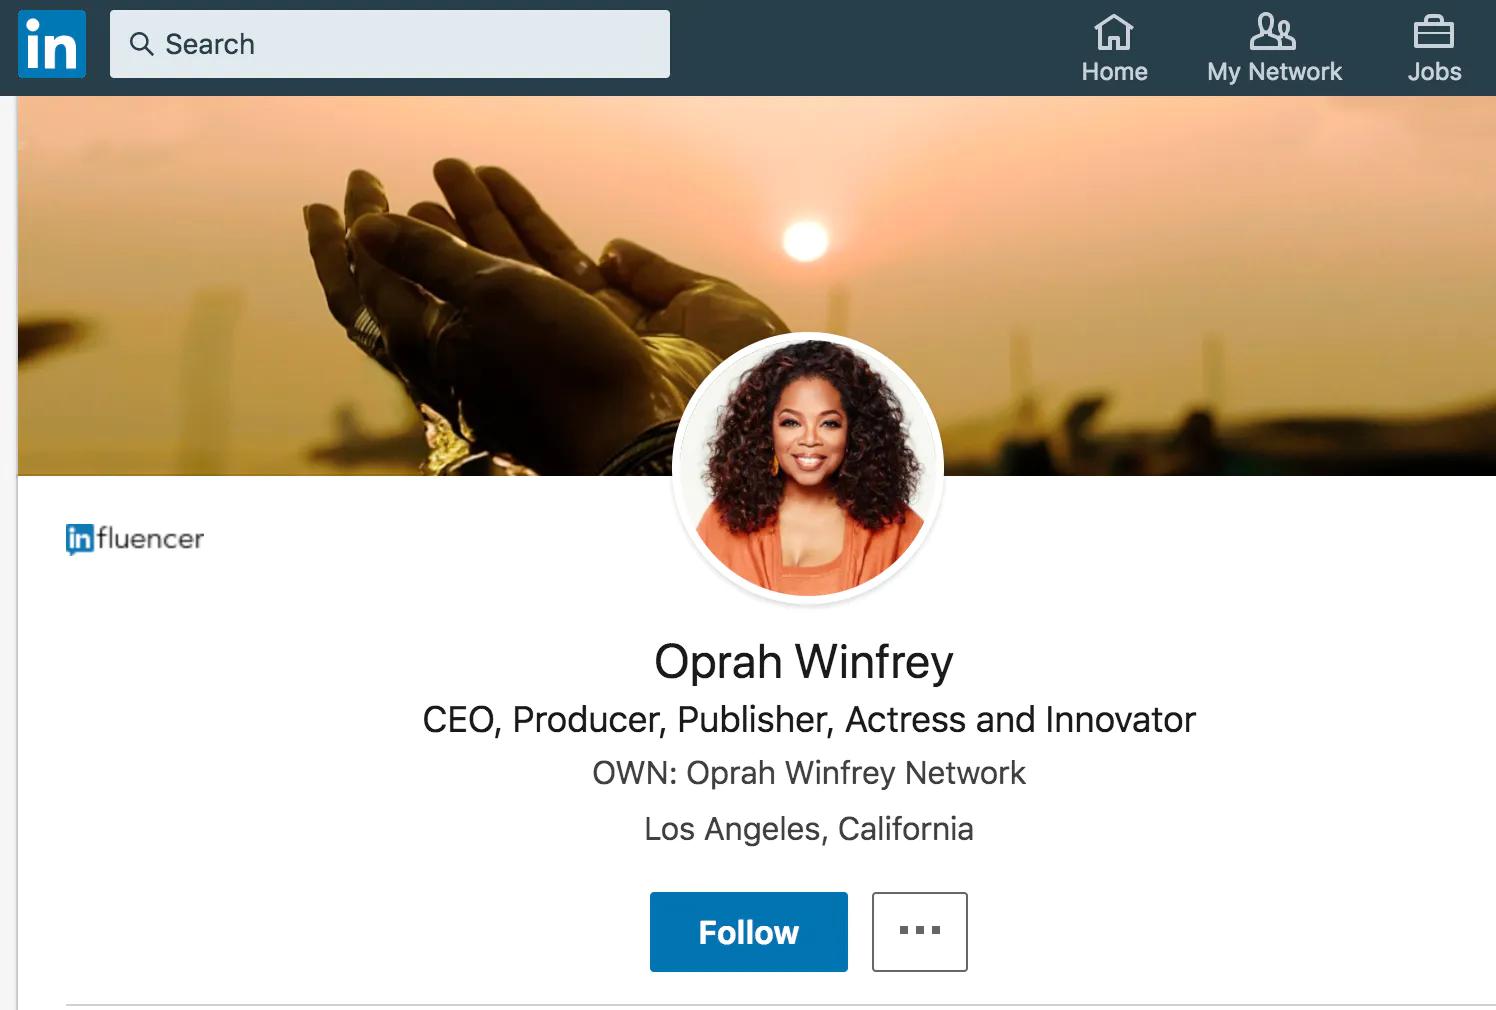 LinkedIn influencer badge, Oprah Winfrey